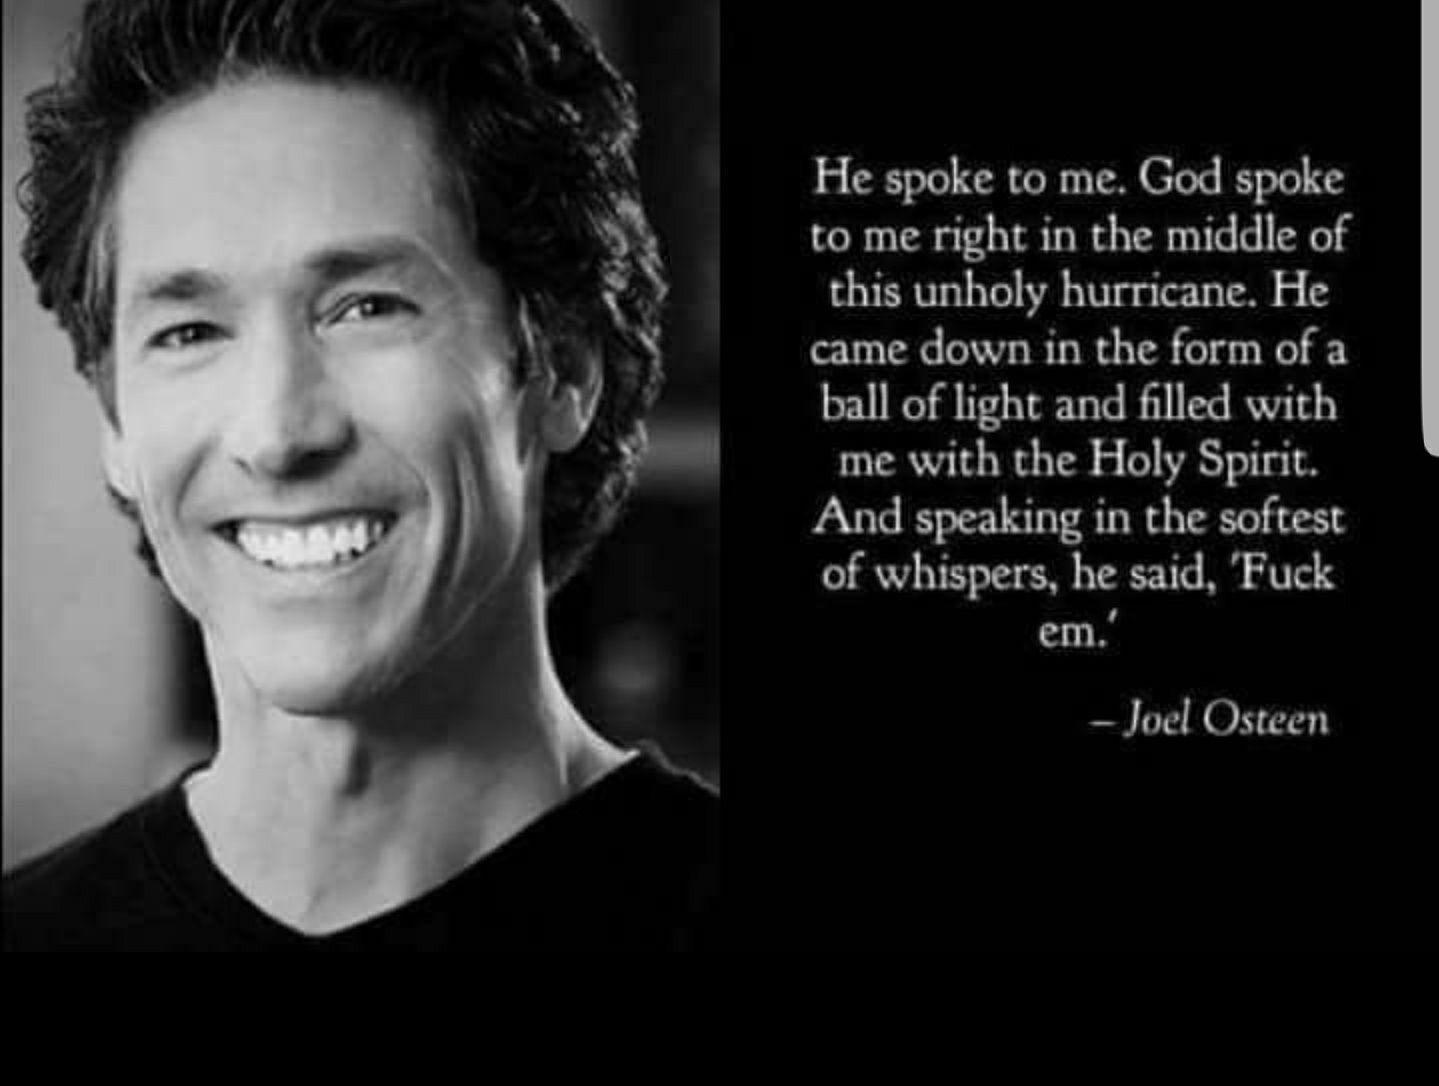 B4 U Judge Joel Osteen How About U Hear His Side Joel Osteen Quotes Funny Quotes Funny Texts